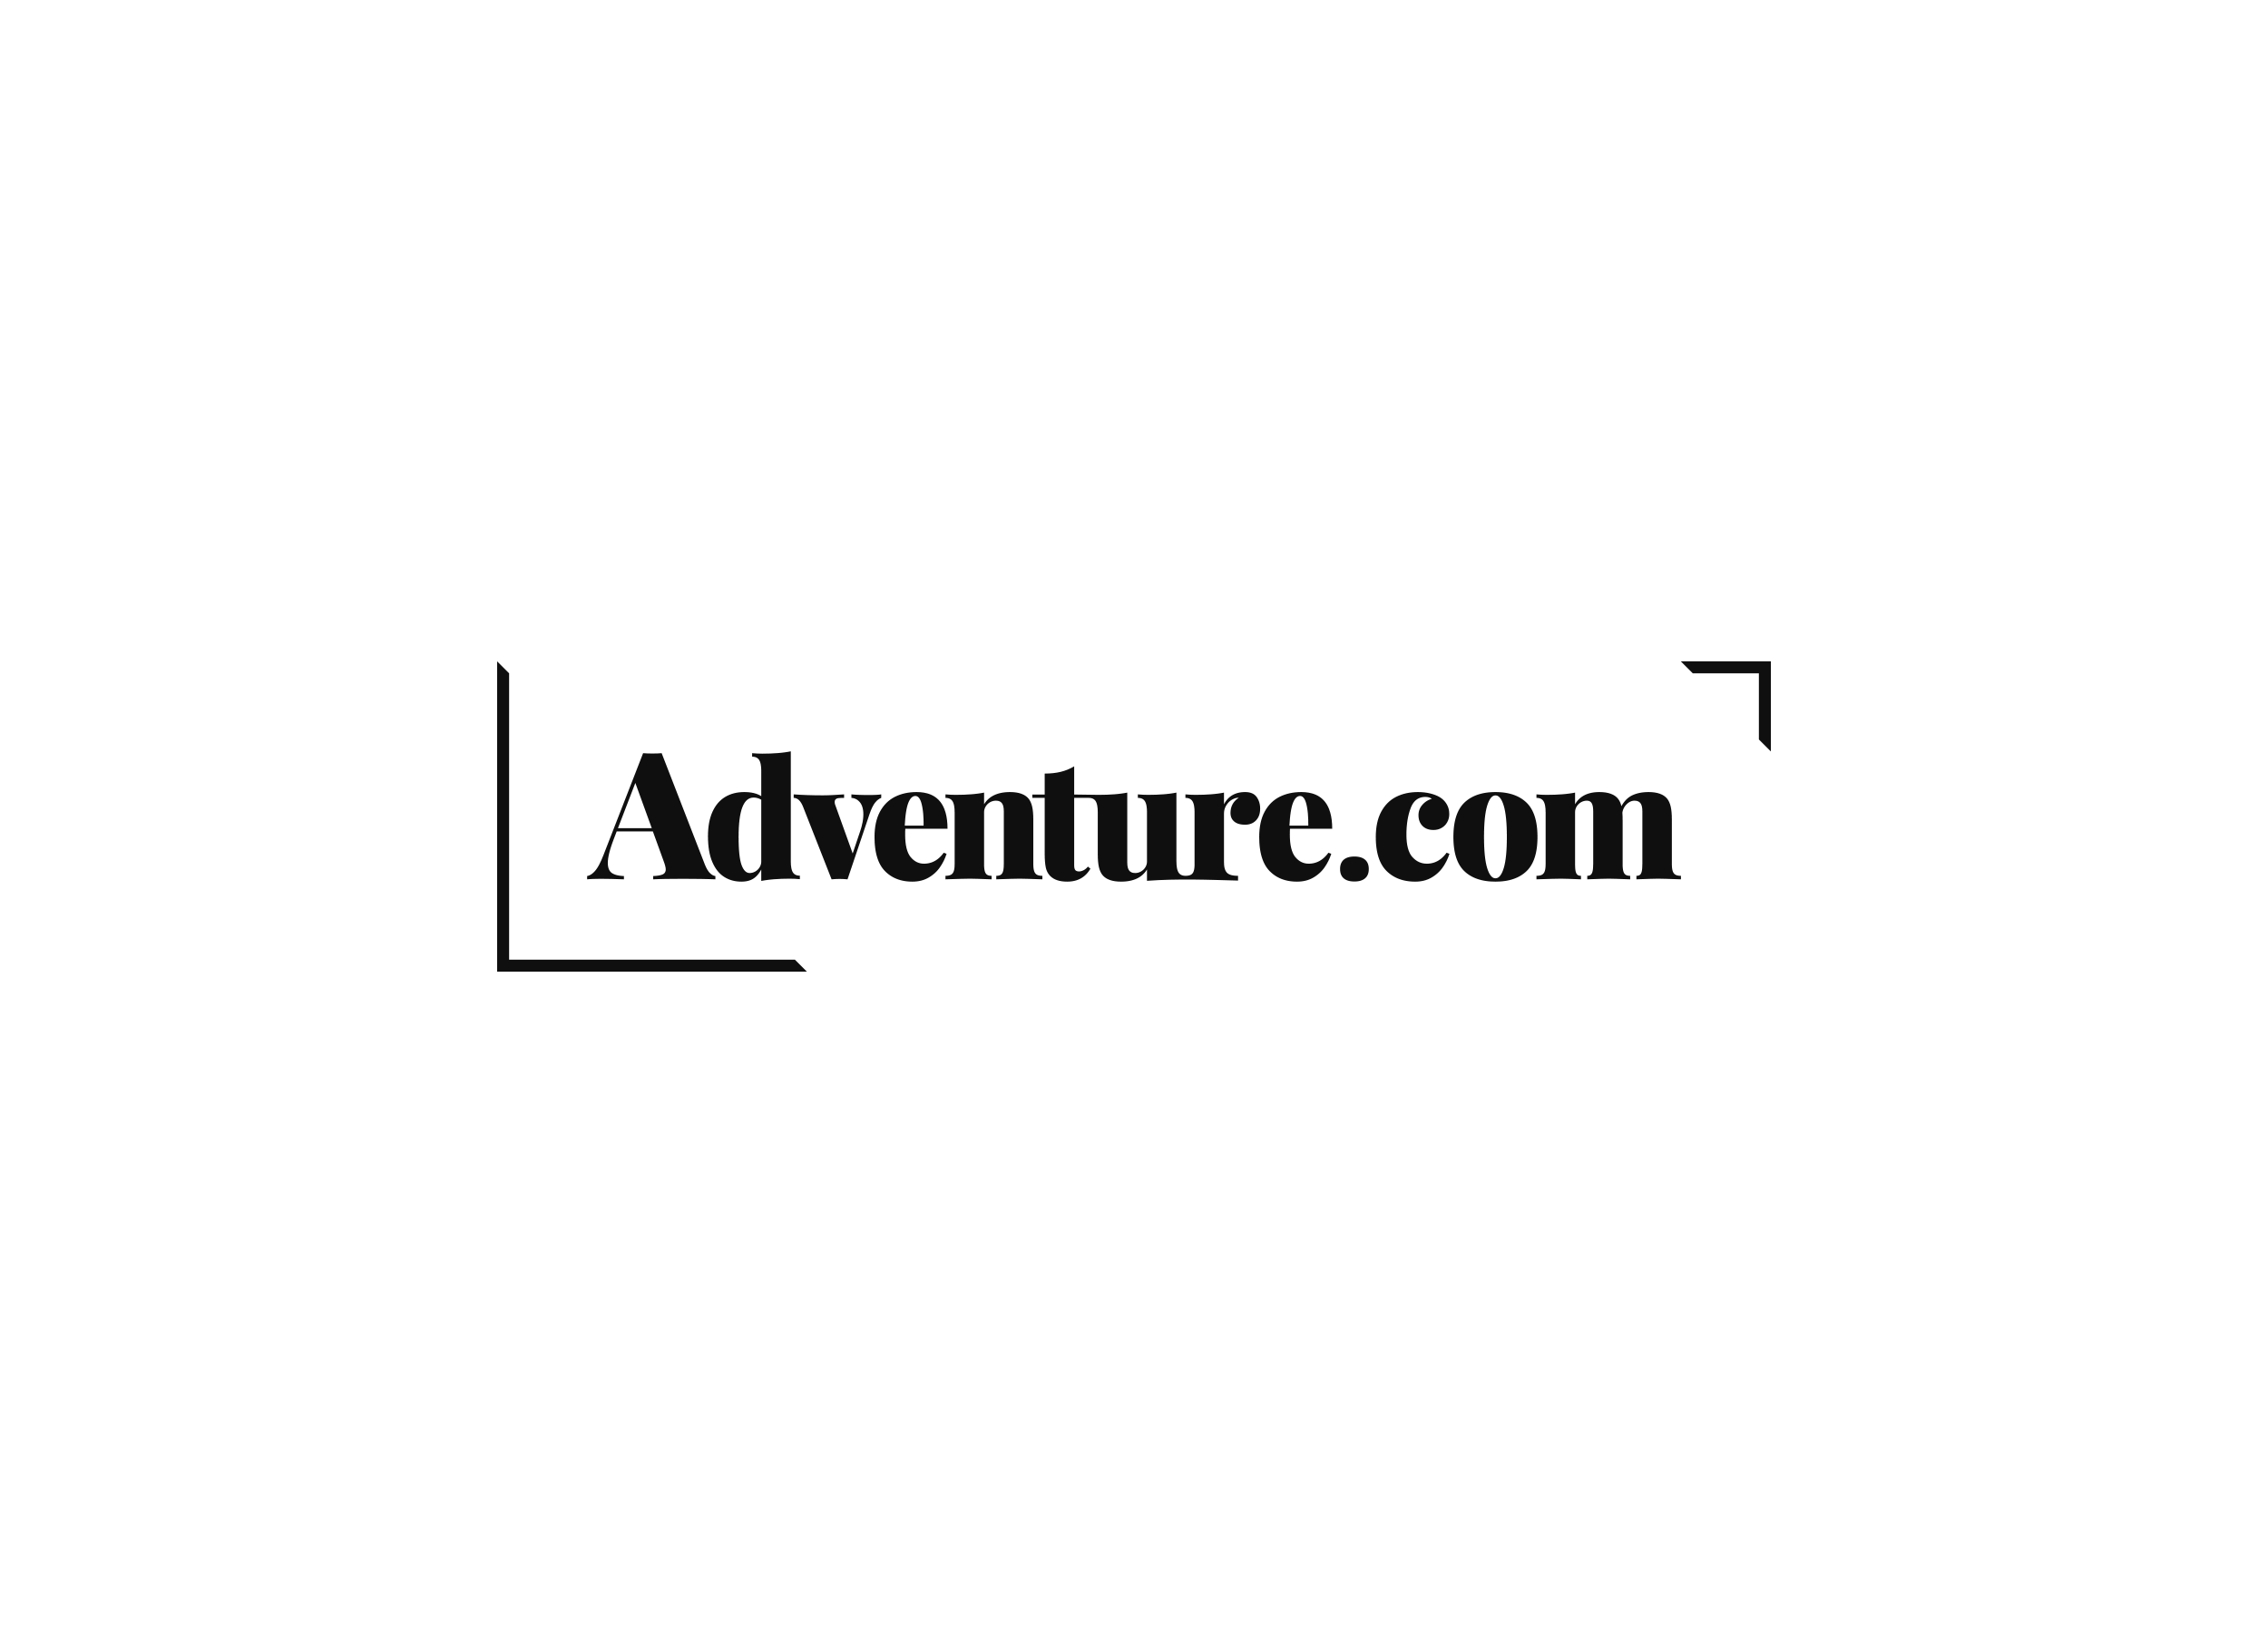 Adventure.com.png